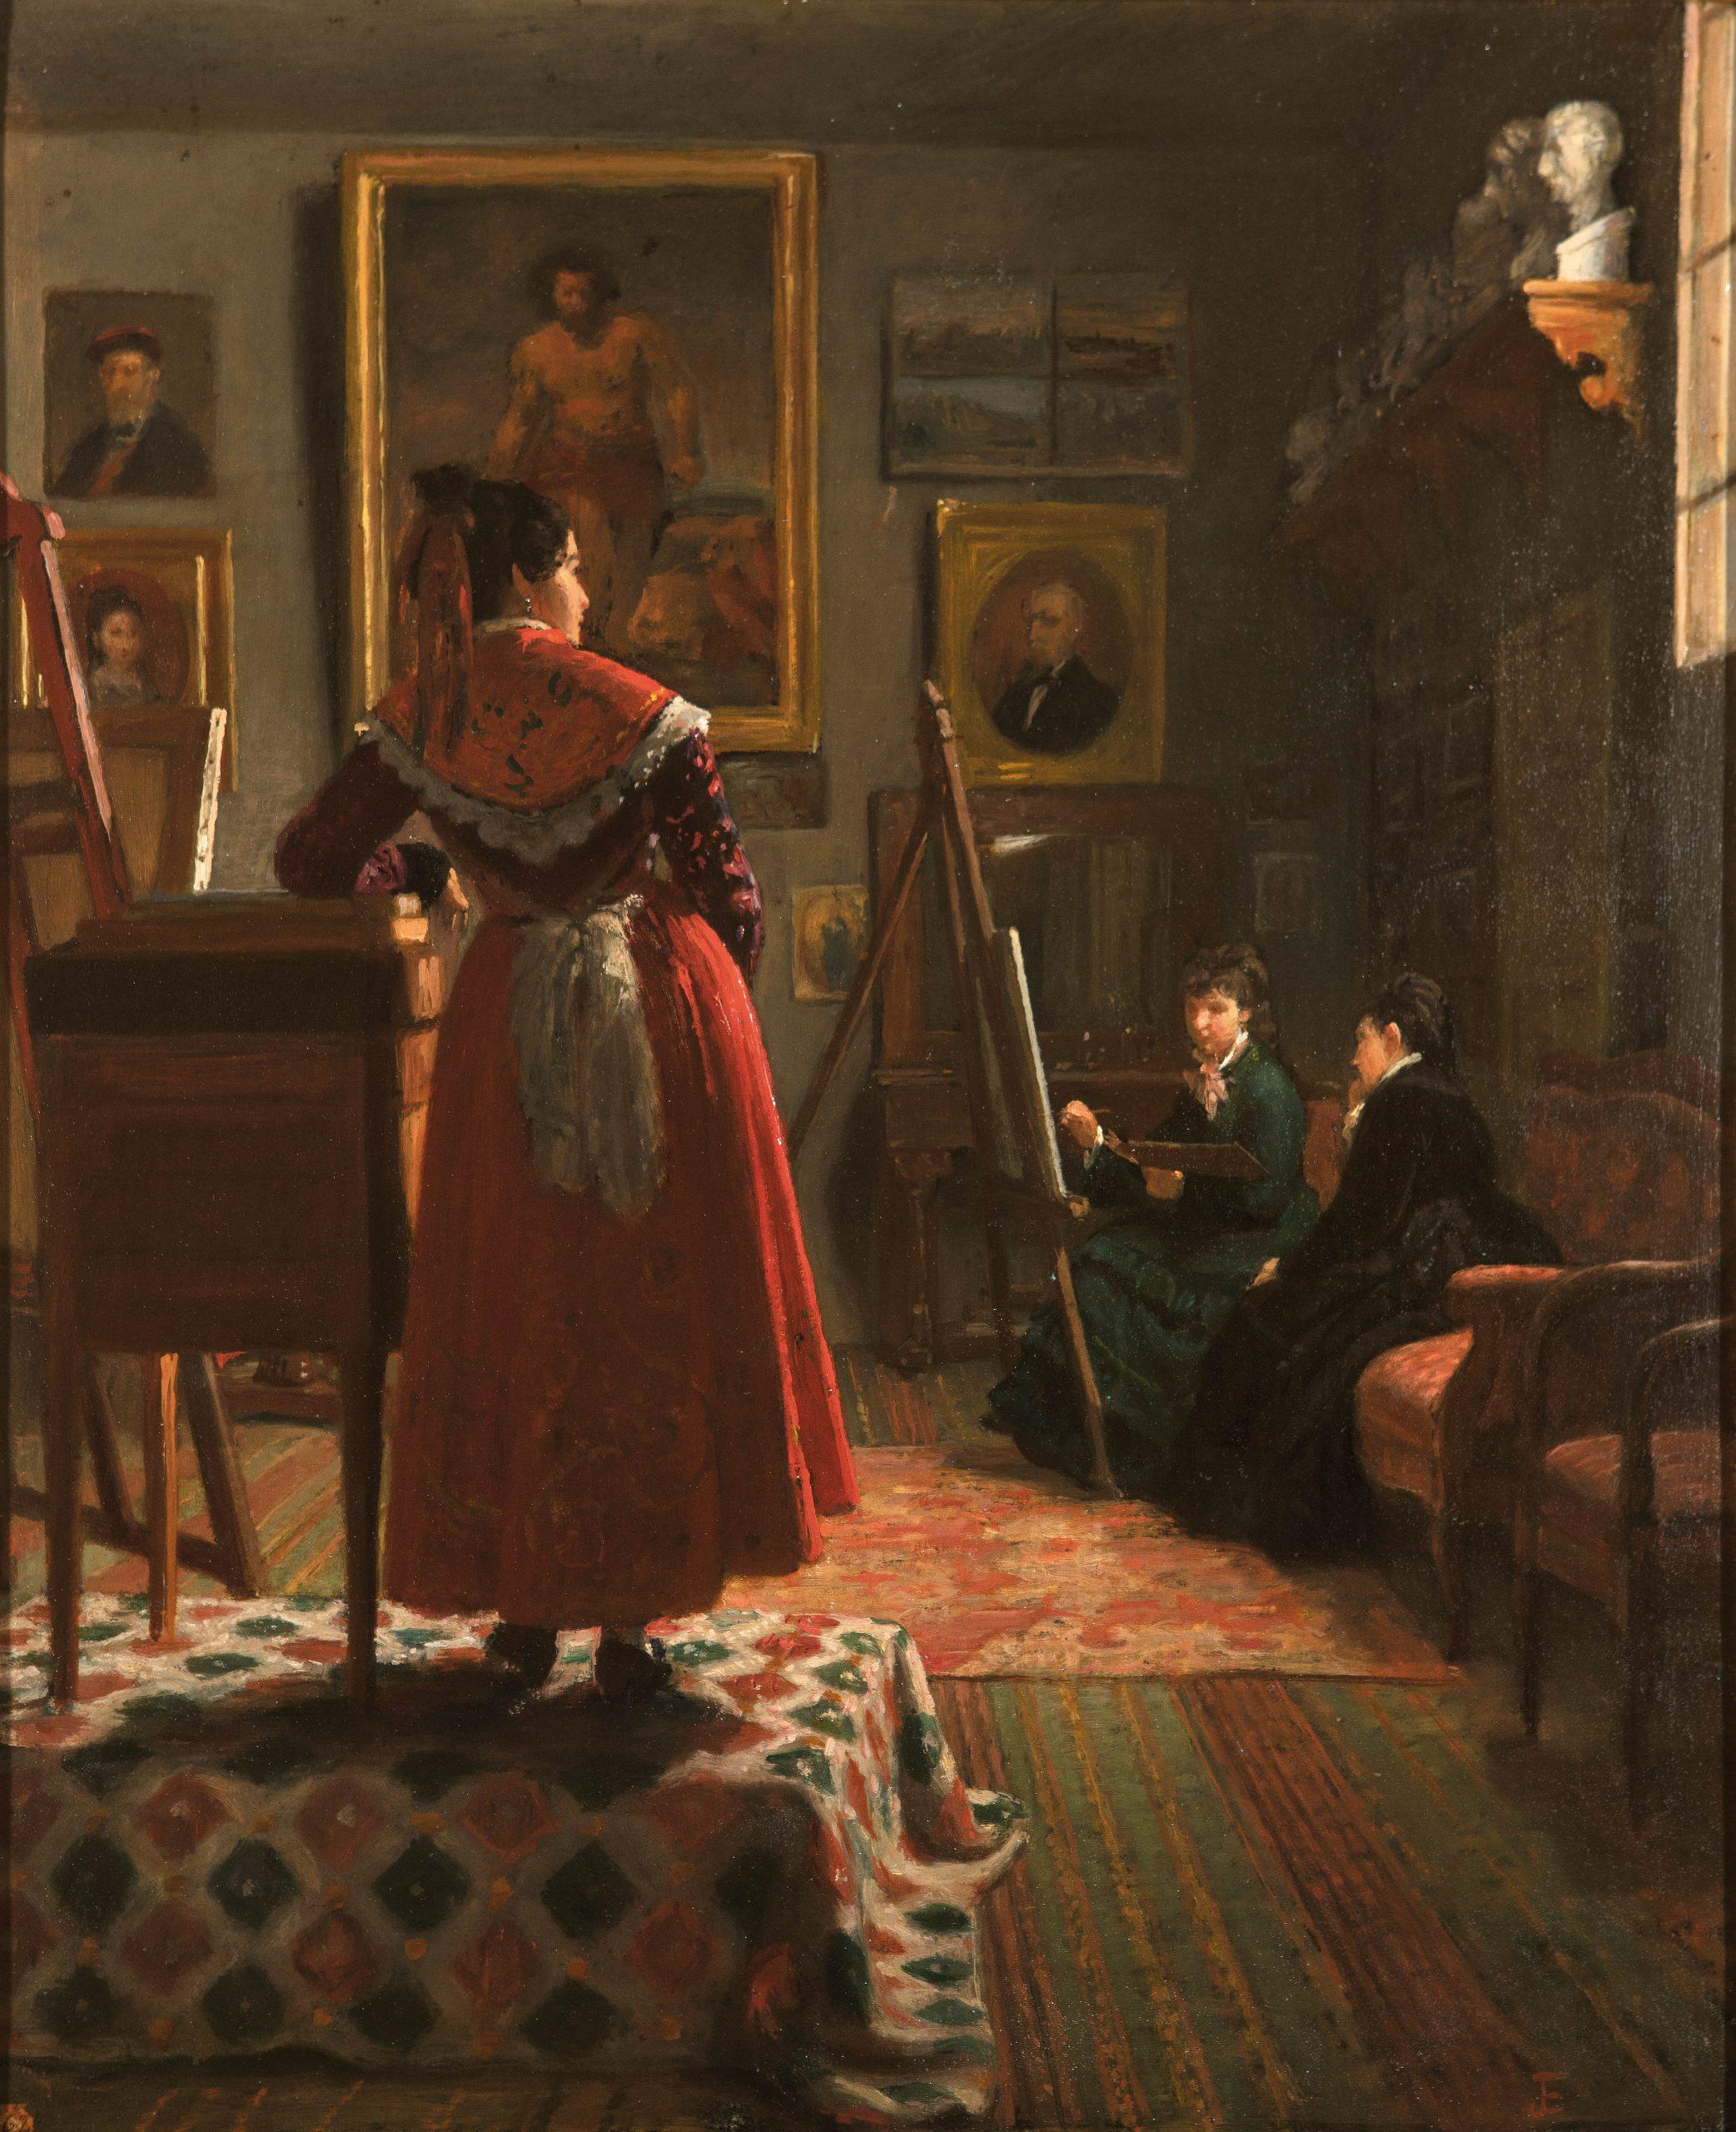 15-Interior-de-un-taller-Joaquin-Espalter-y-Rull-1809-1880-Oleo-sobre-lienzo-h.-1875-–-1880-Madrid-Museo-Nacional-del-Romanticismo-scaled